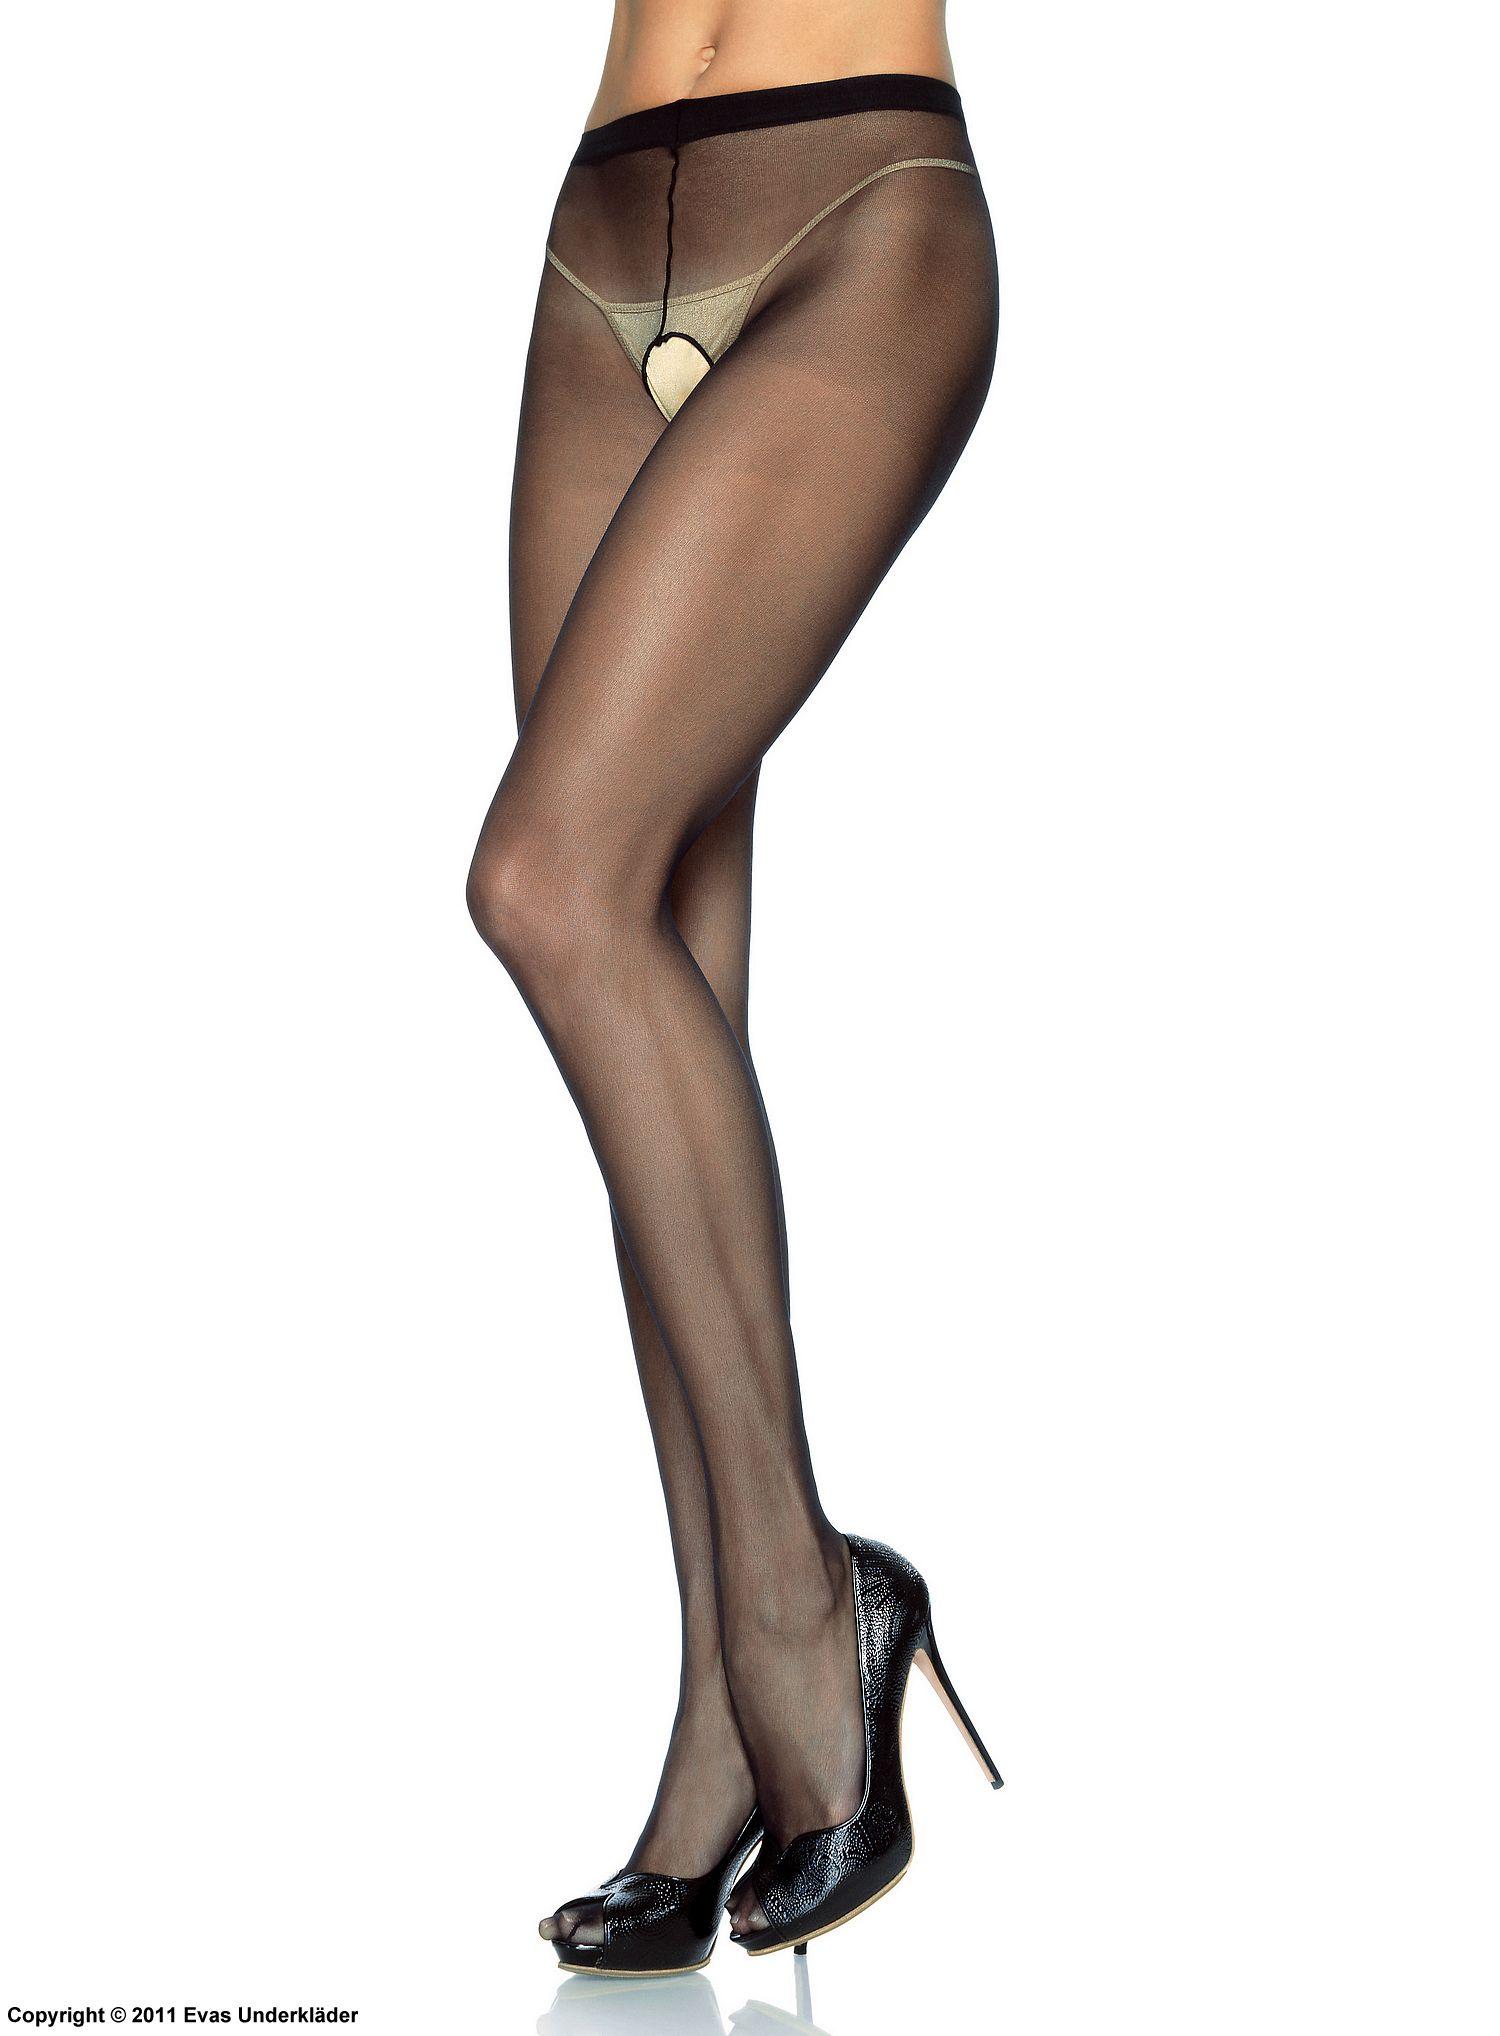 minikjolar sexiga mogna kvinnor